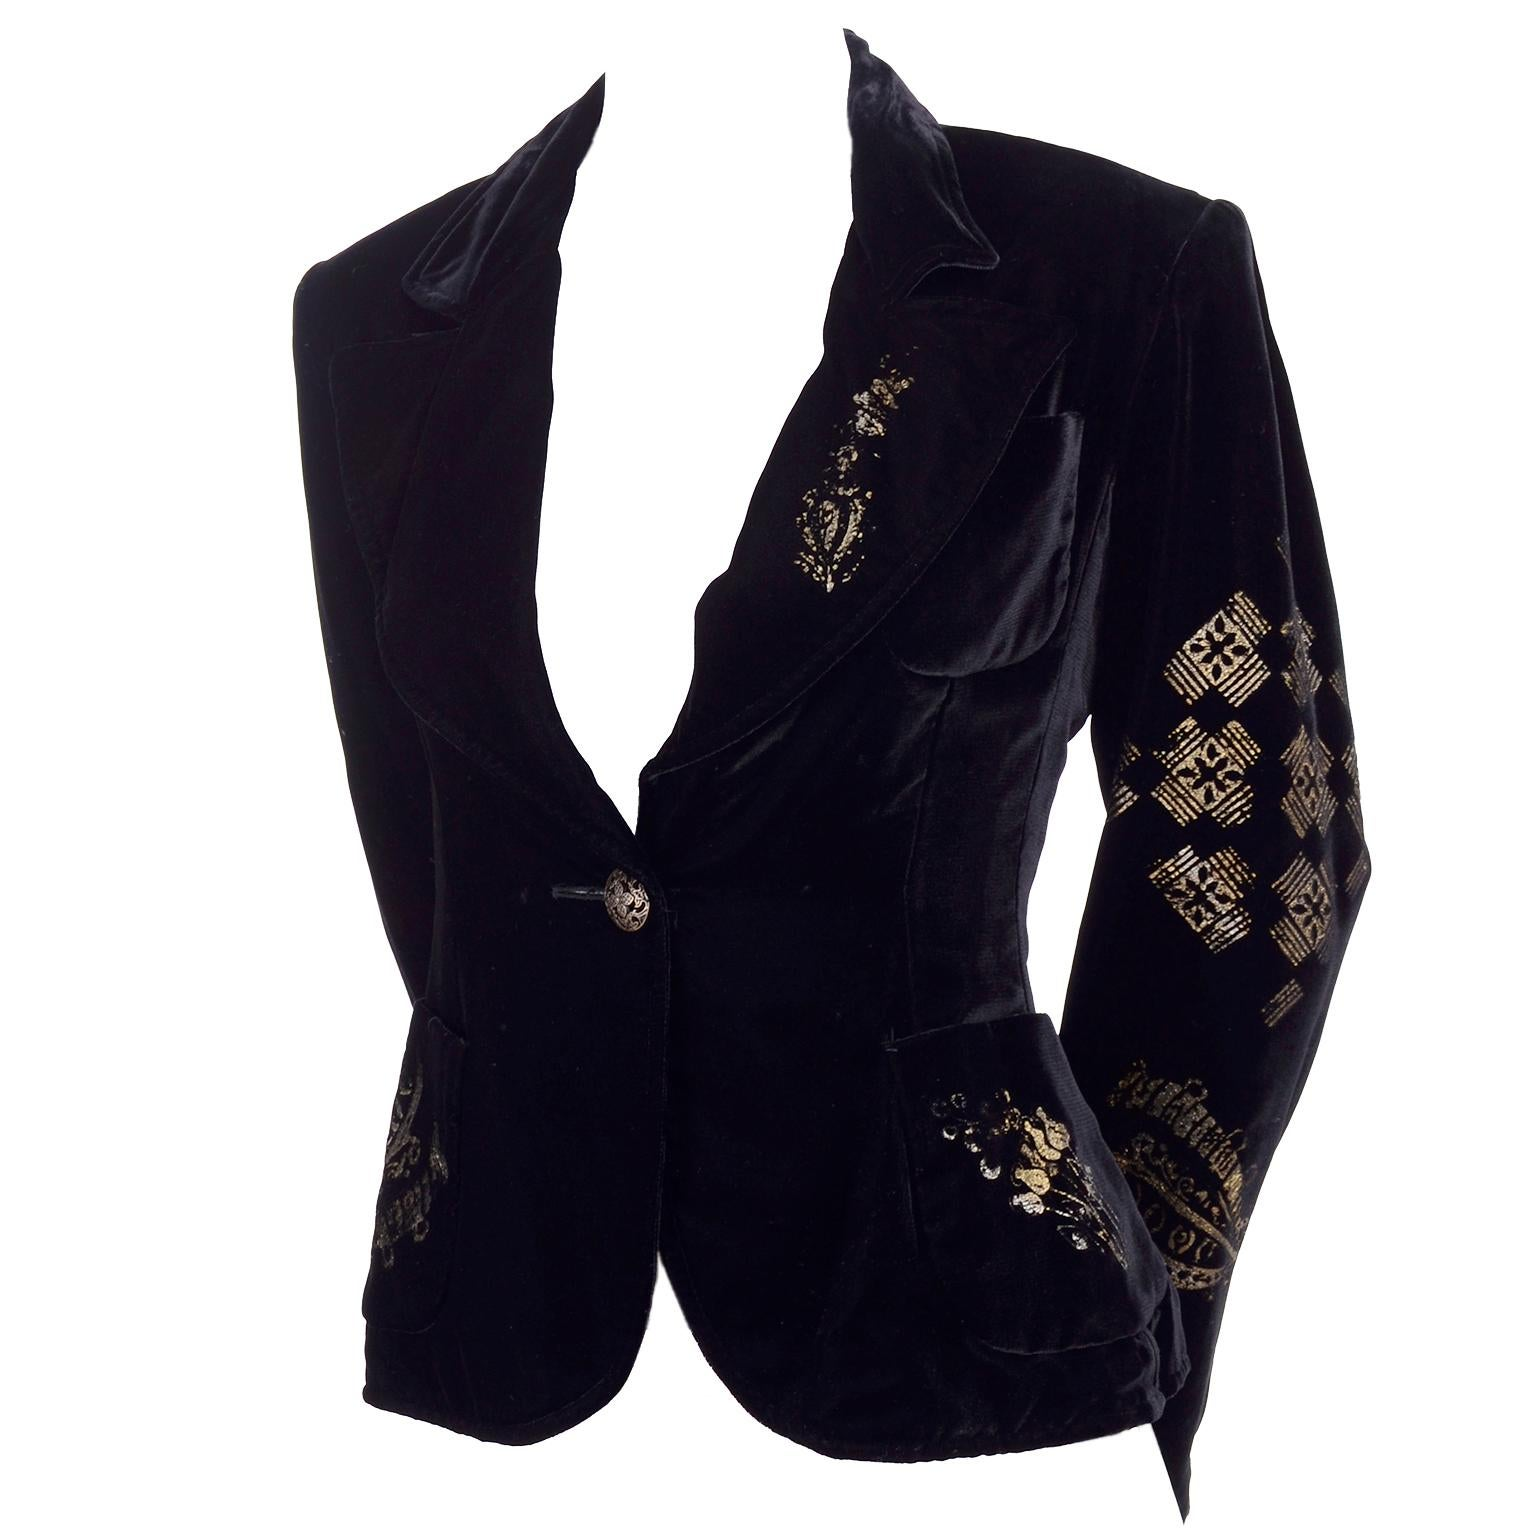 1990s Christian Lacroix Black Velvet Blazer Gold Stencil Stamped Pattern Jacket